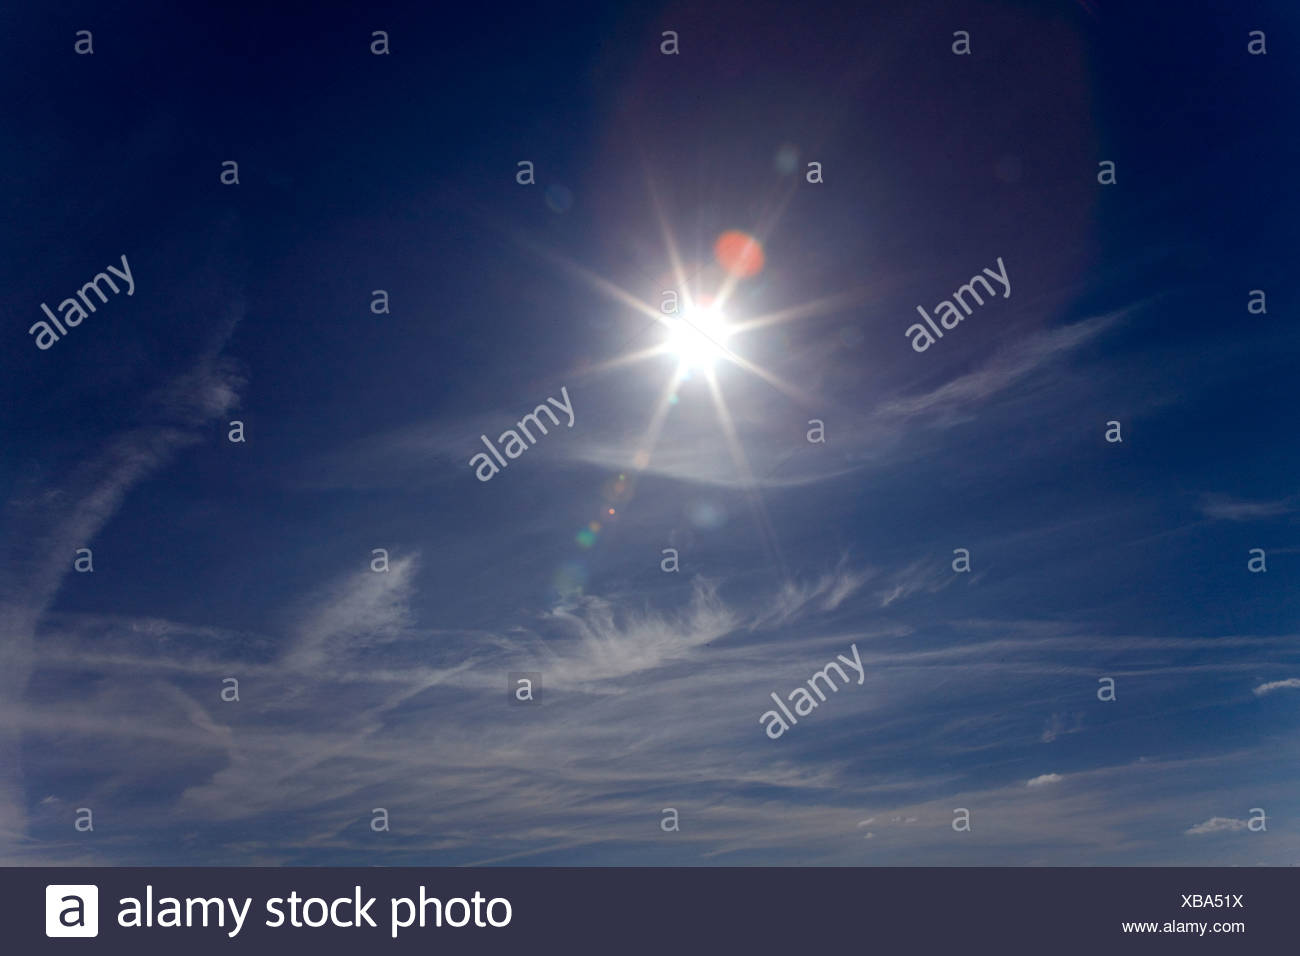 Sun shining in blue sky - Stock Image